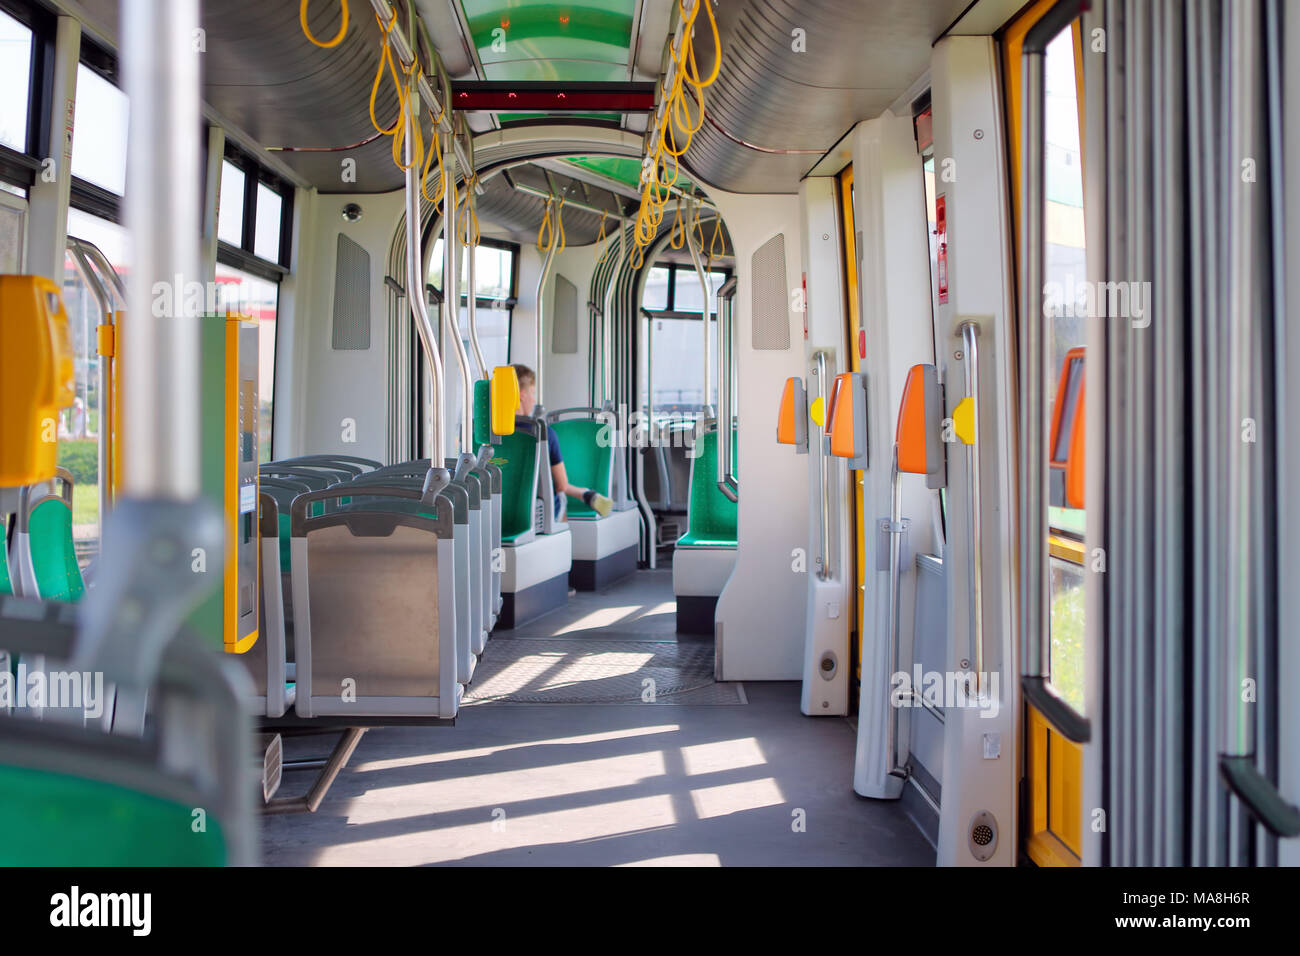 Modern city tram interior - Stock Image